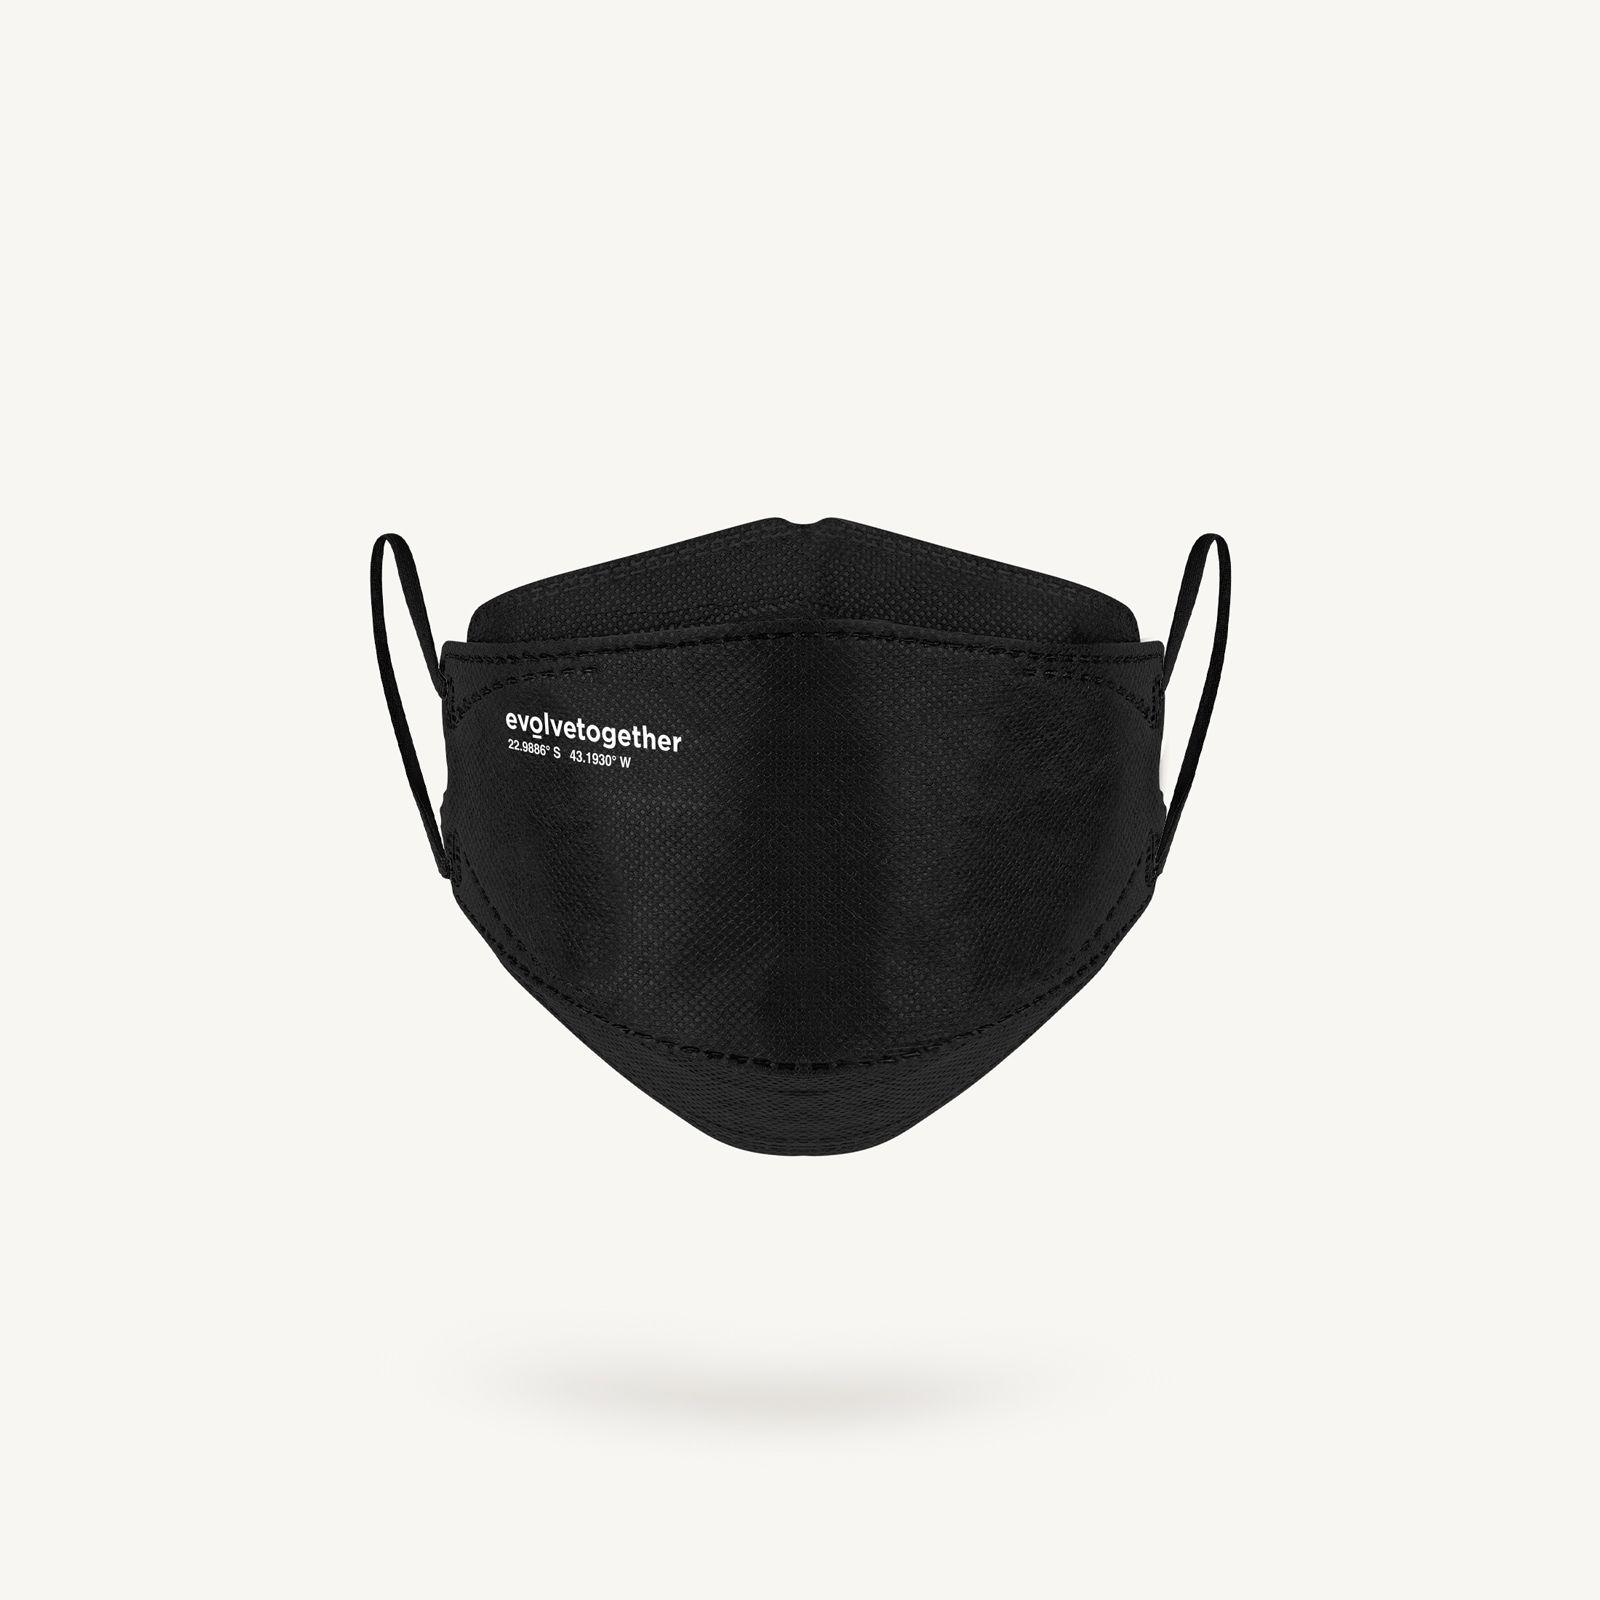 rio - 5 black KN95 masks